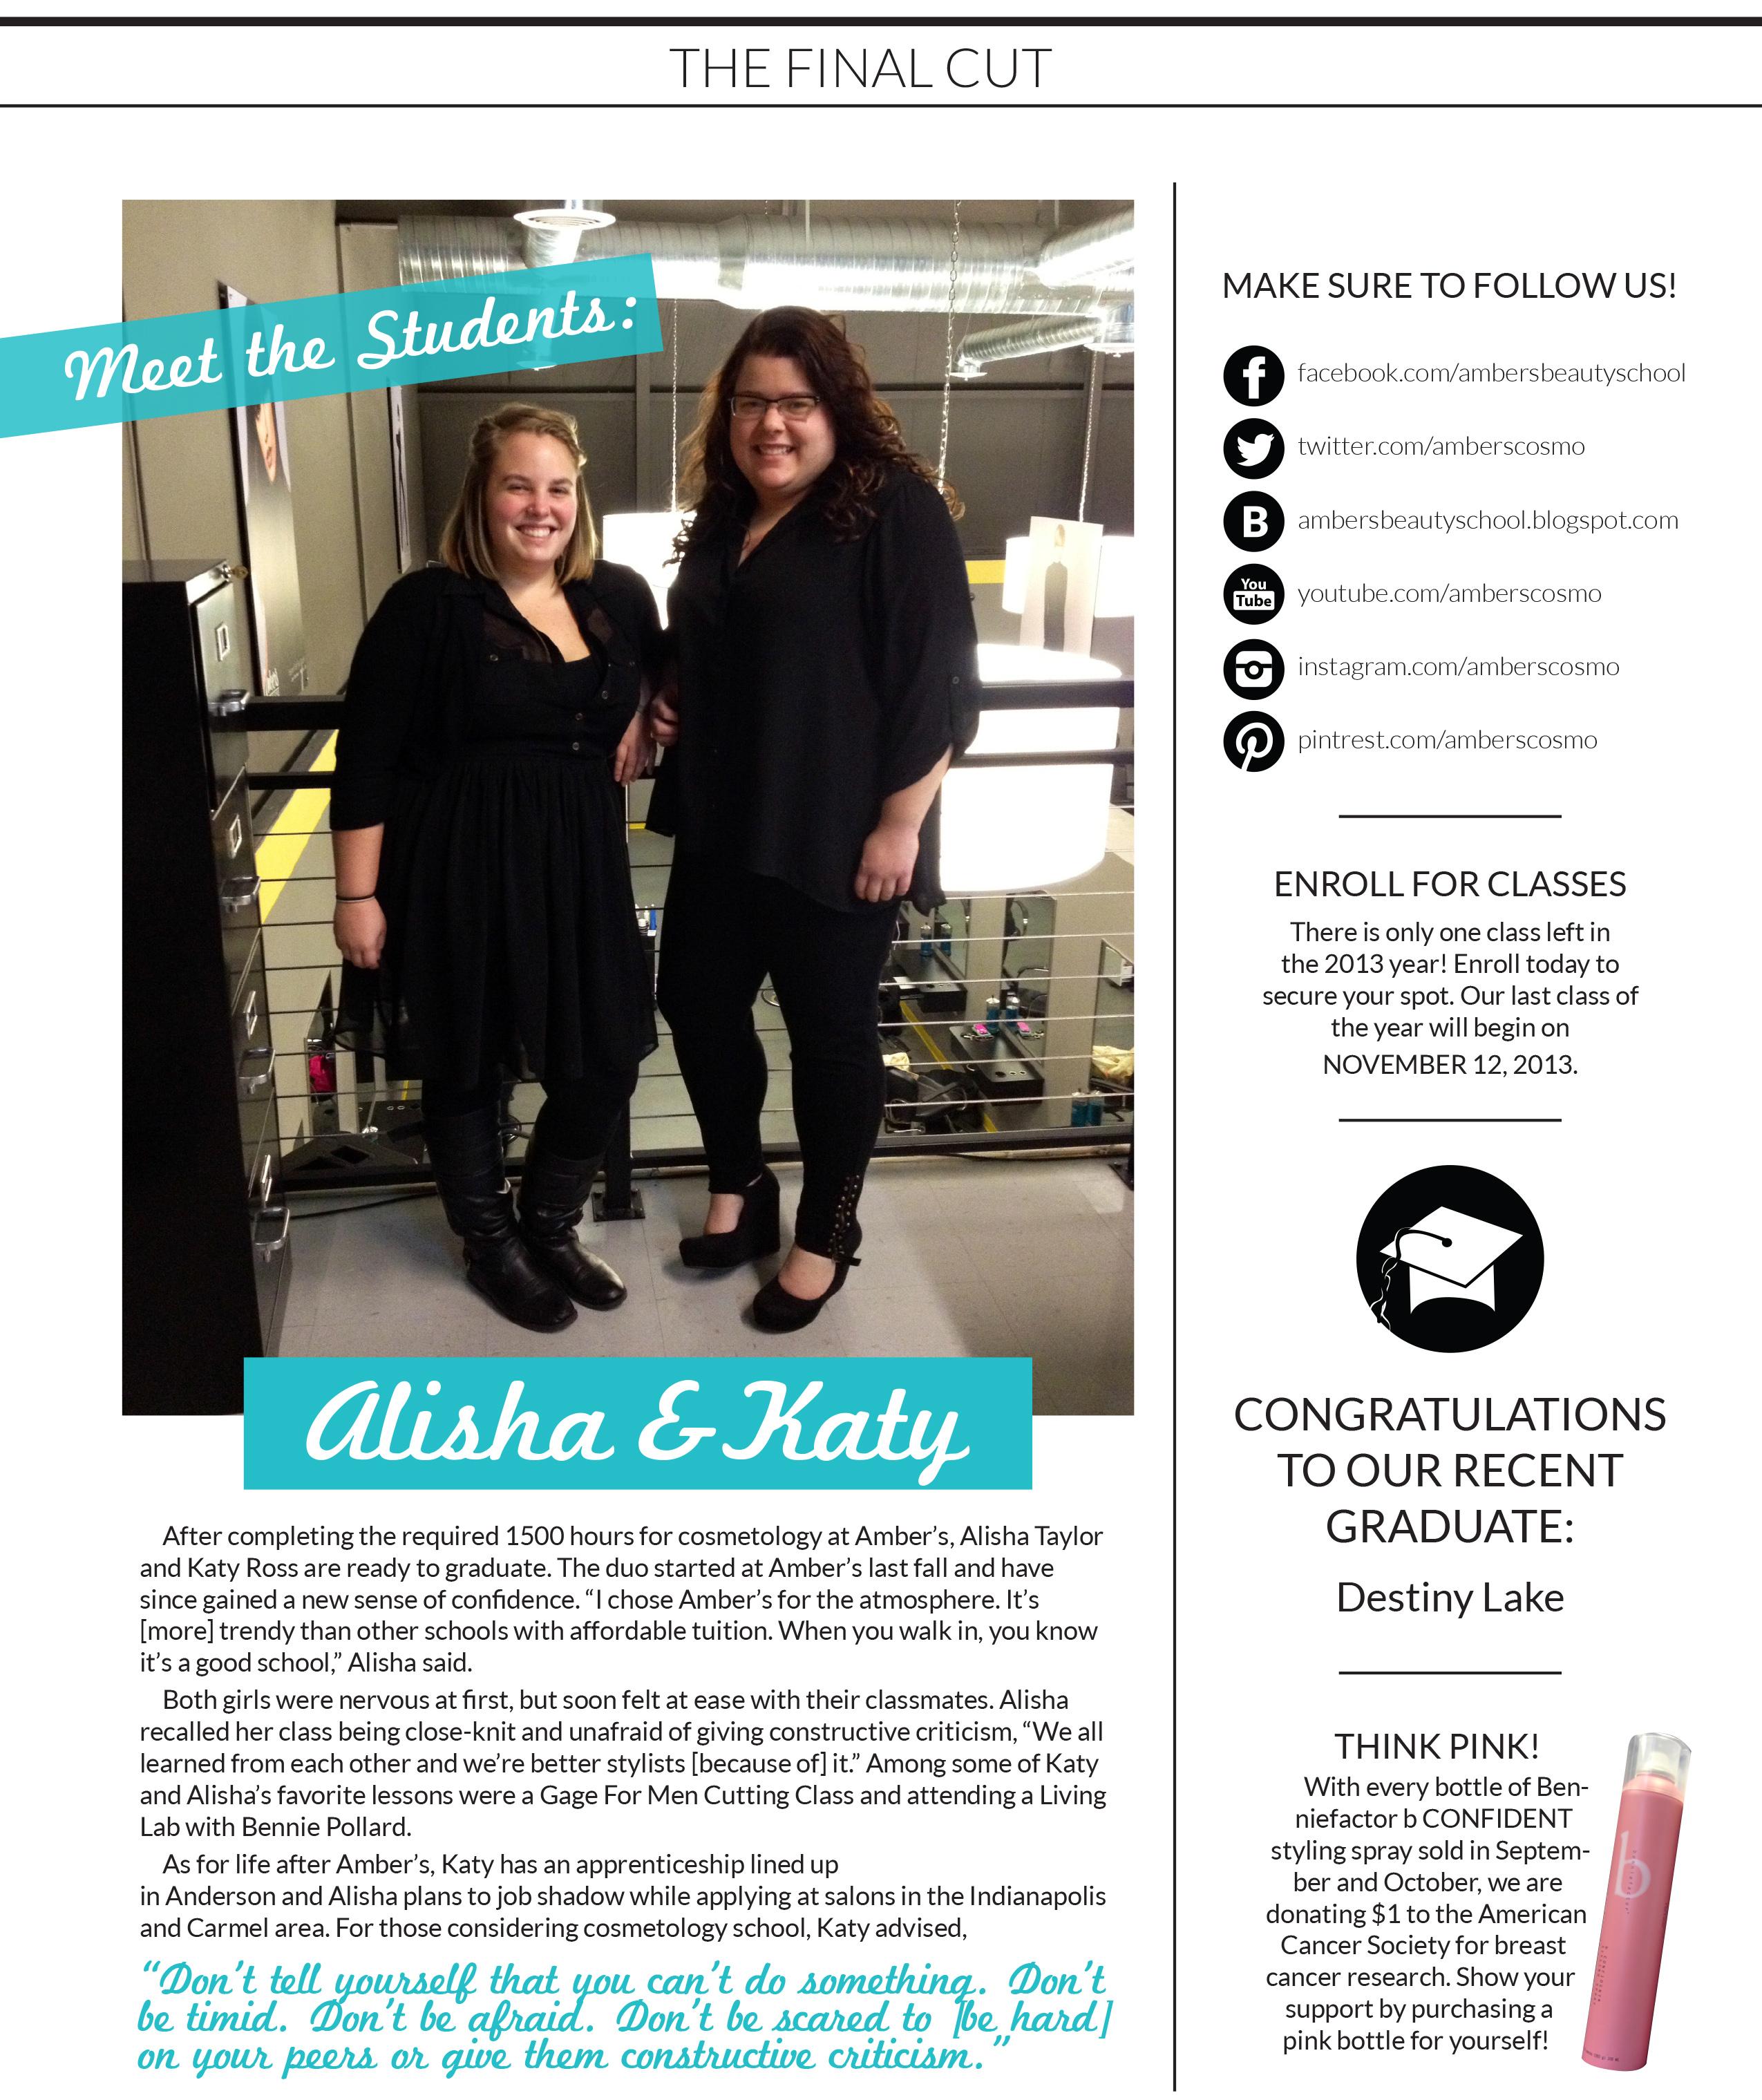 Amber's Beauty School - October 2013 Newsletter